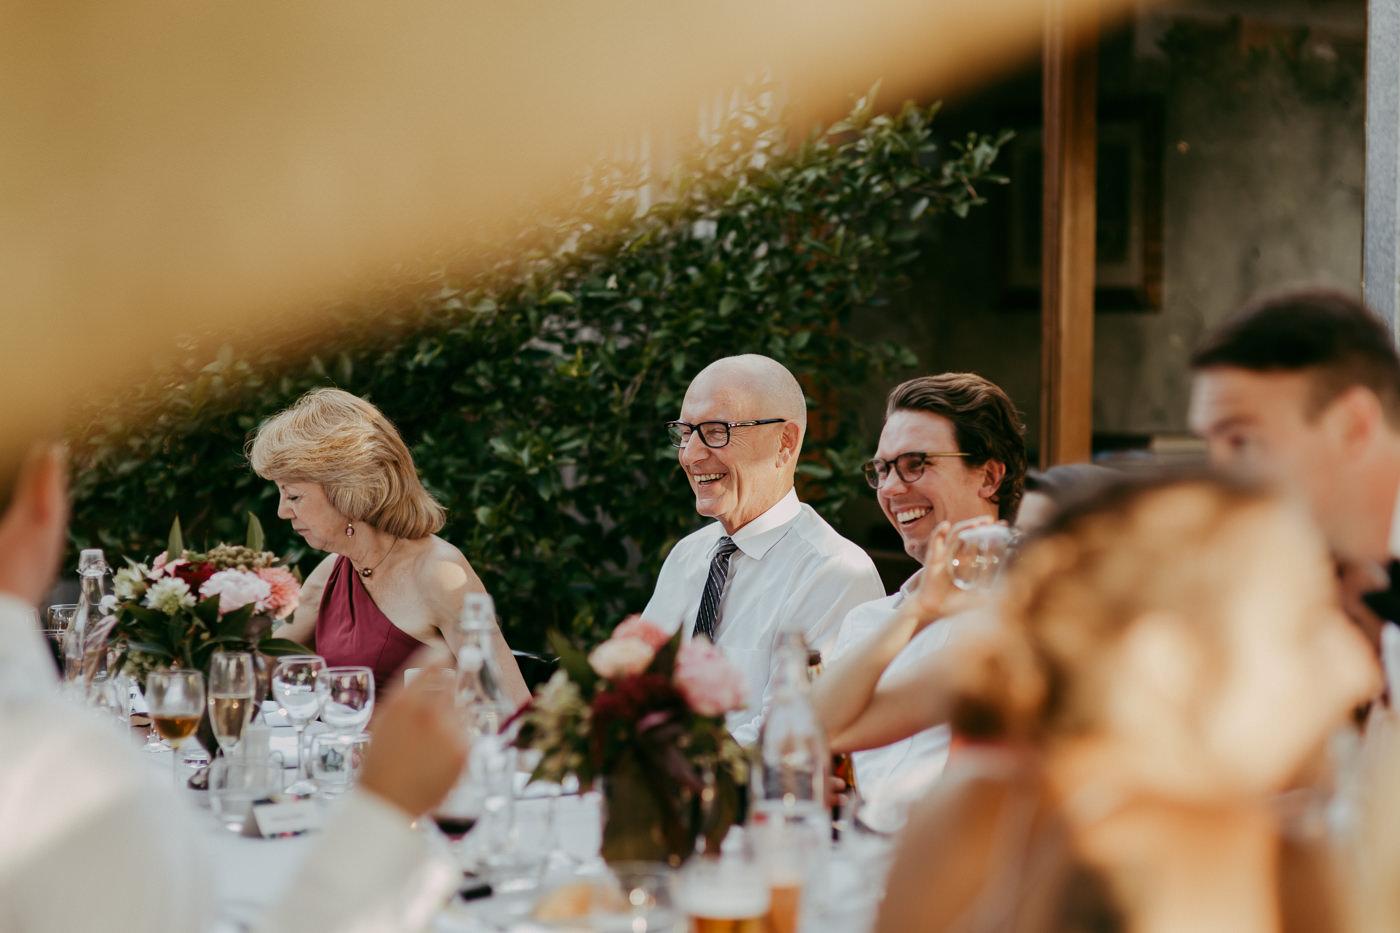 Anthony & Eliet - Wagga Wagga Wedding - Country NSW - Samantha Heather Photography-134.jpg